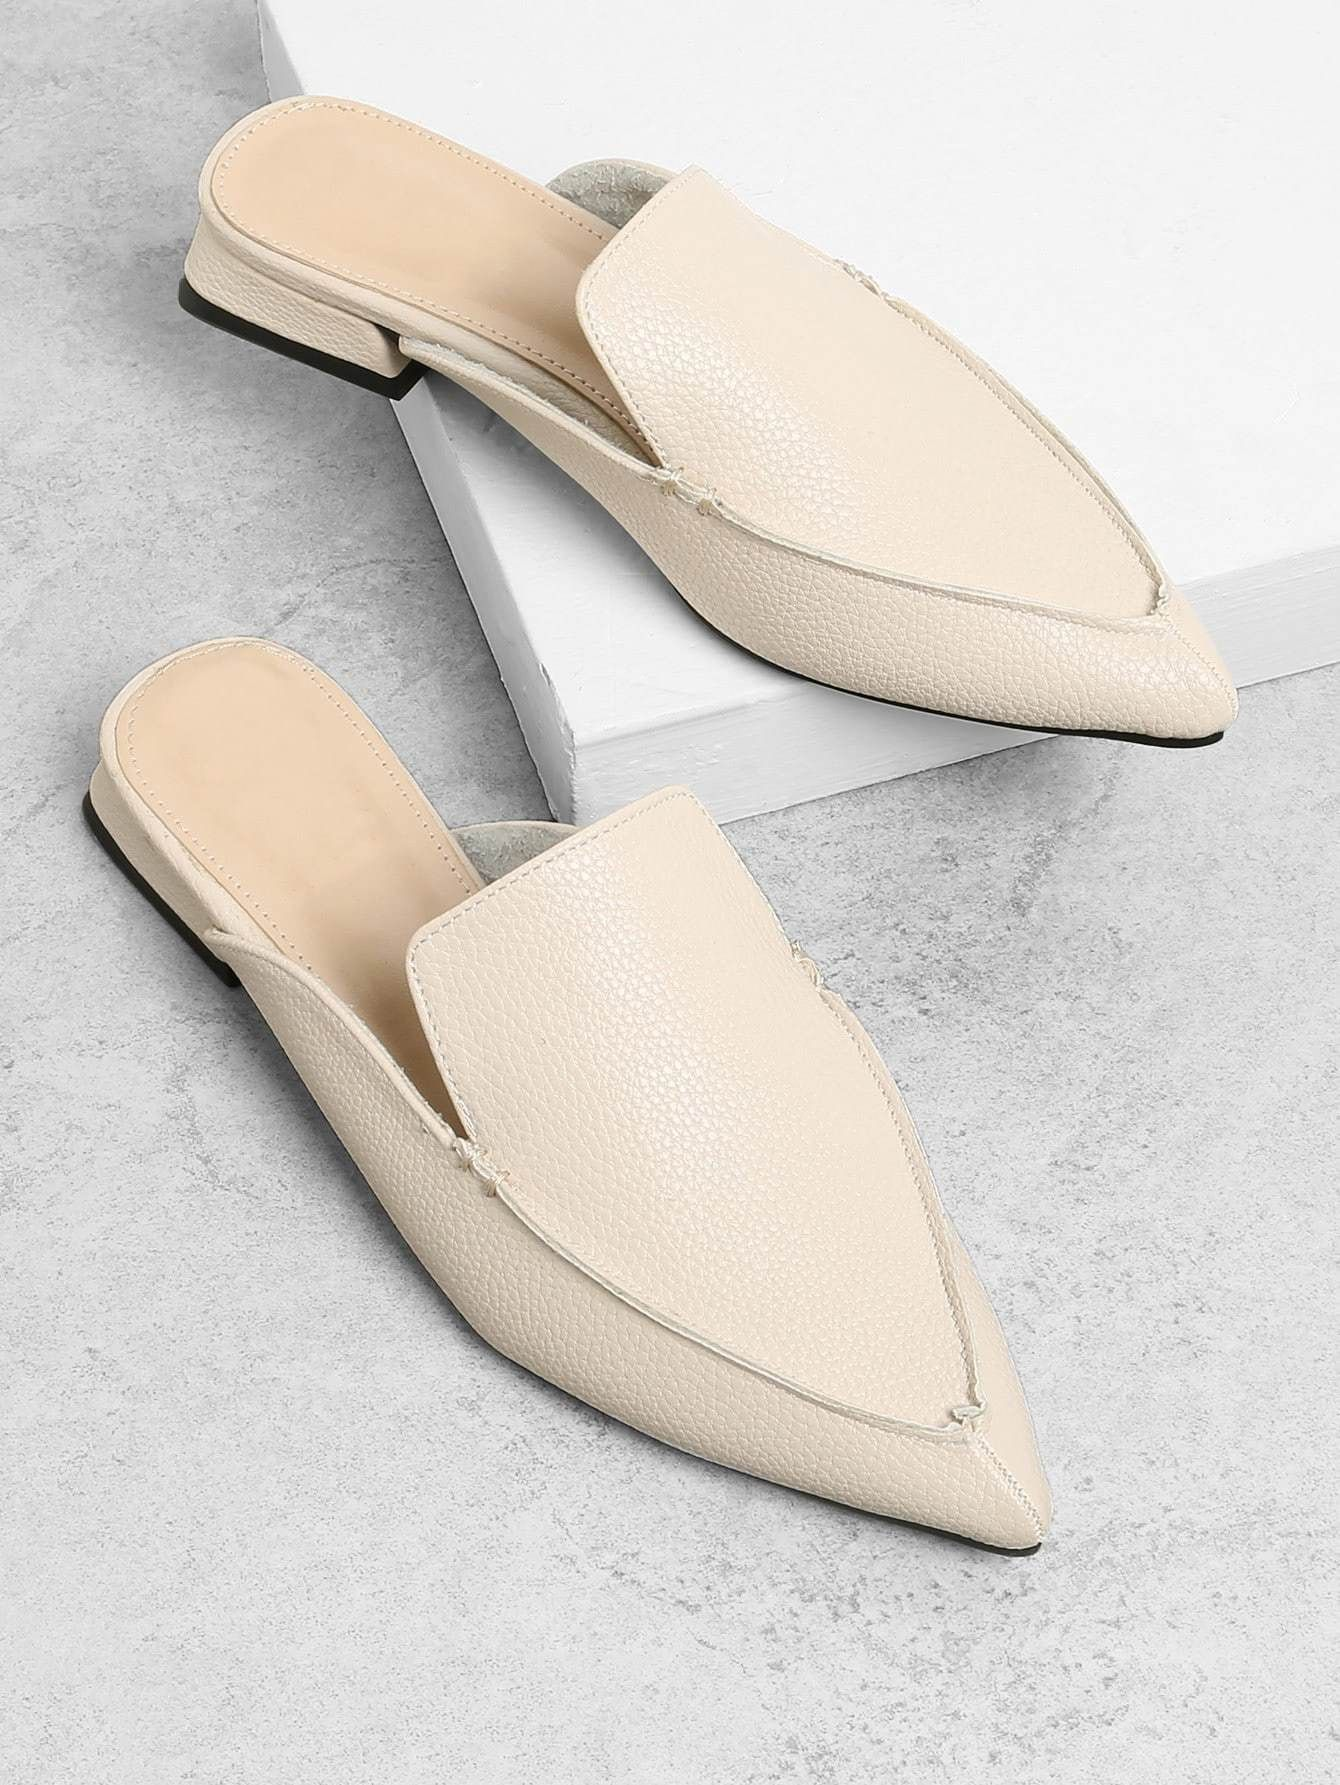 b73e38433 pu pointed toe flat mules. #flats #shoes #women #fashion | Outfits ...